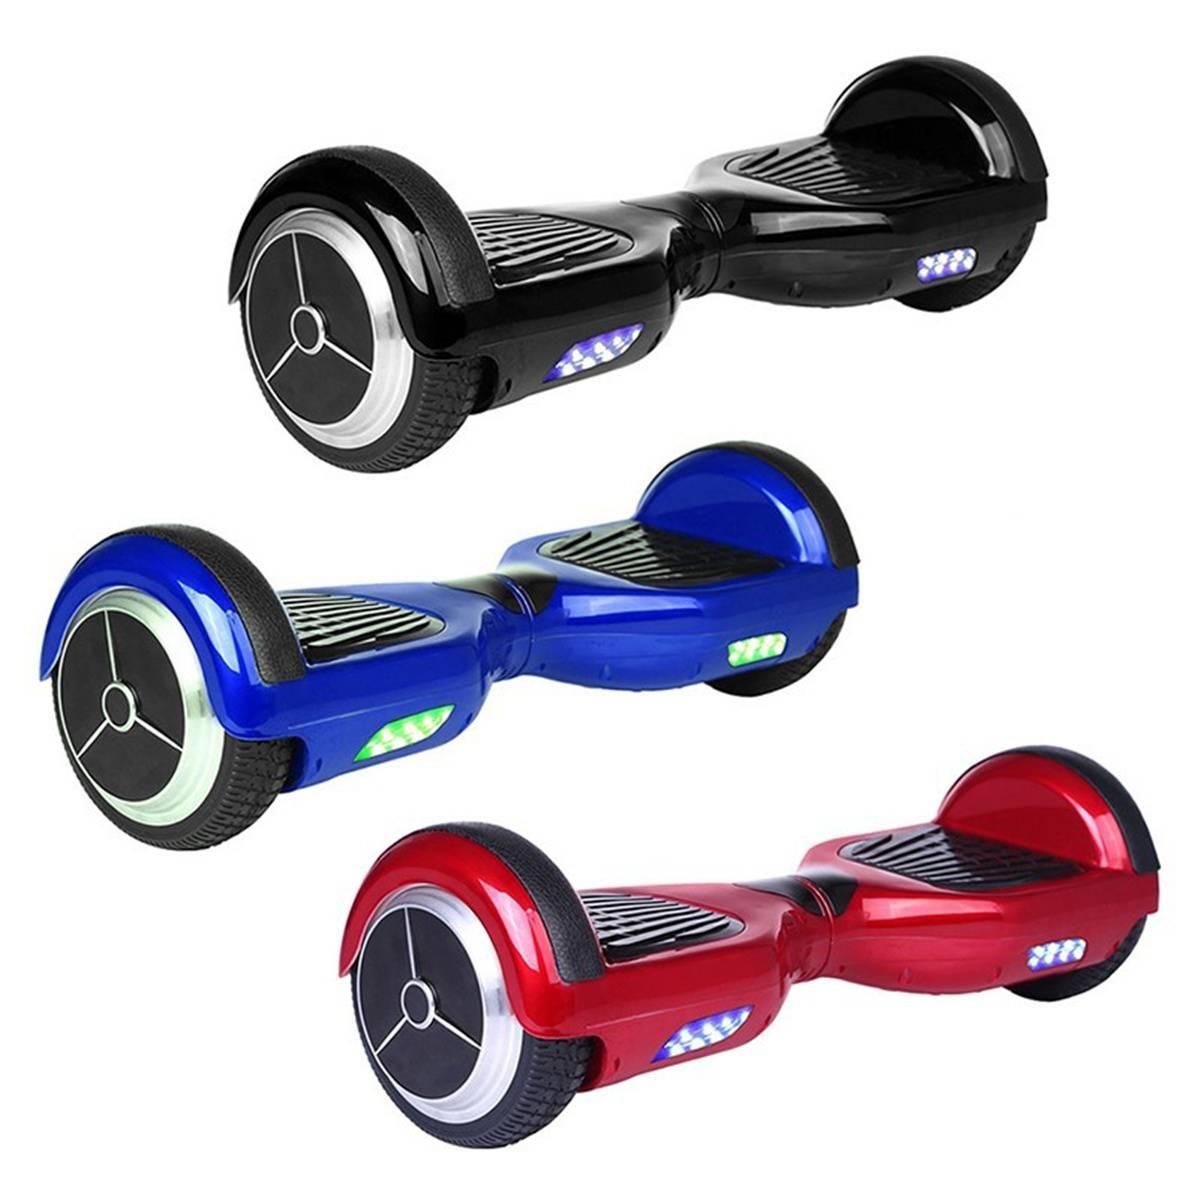 XB1 Dual Wheels Self-balancing Scooter